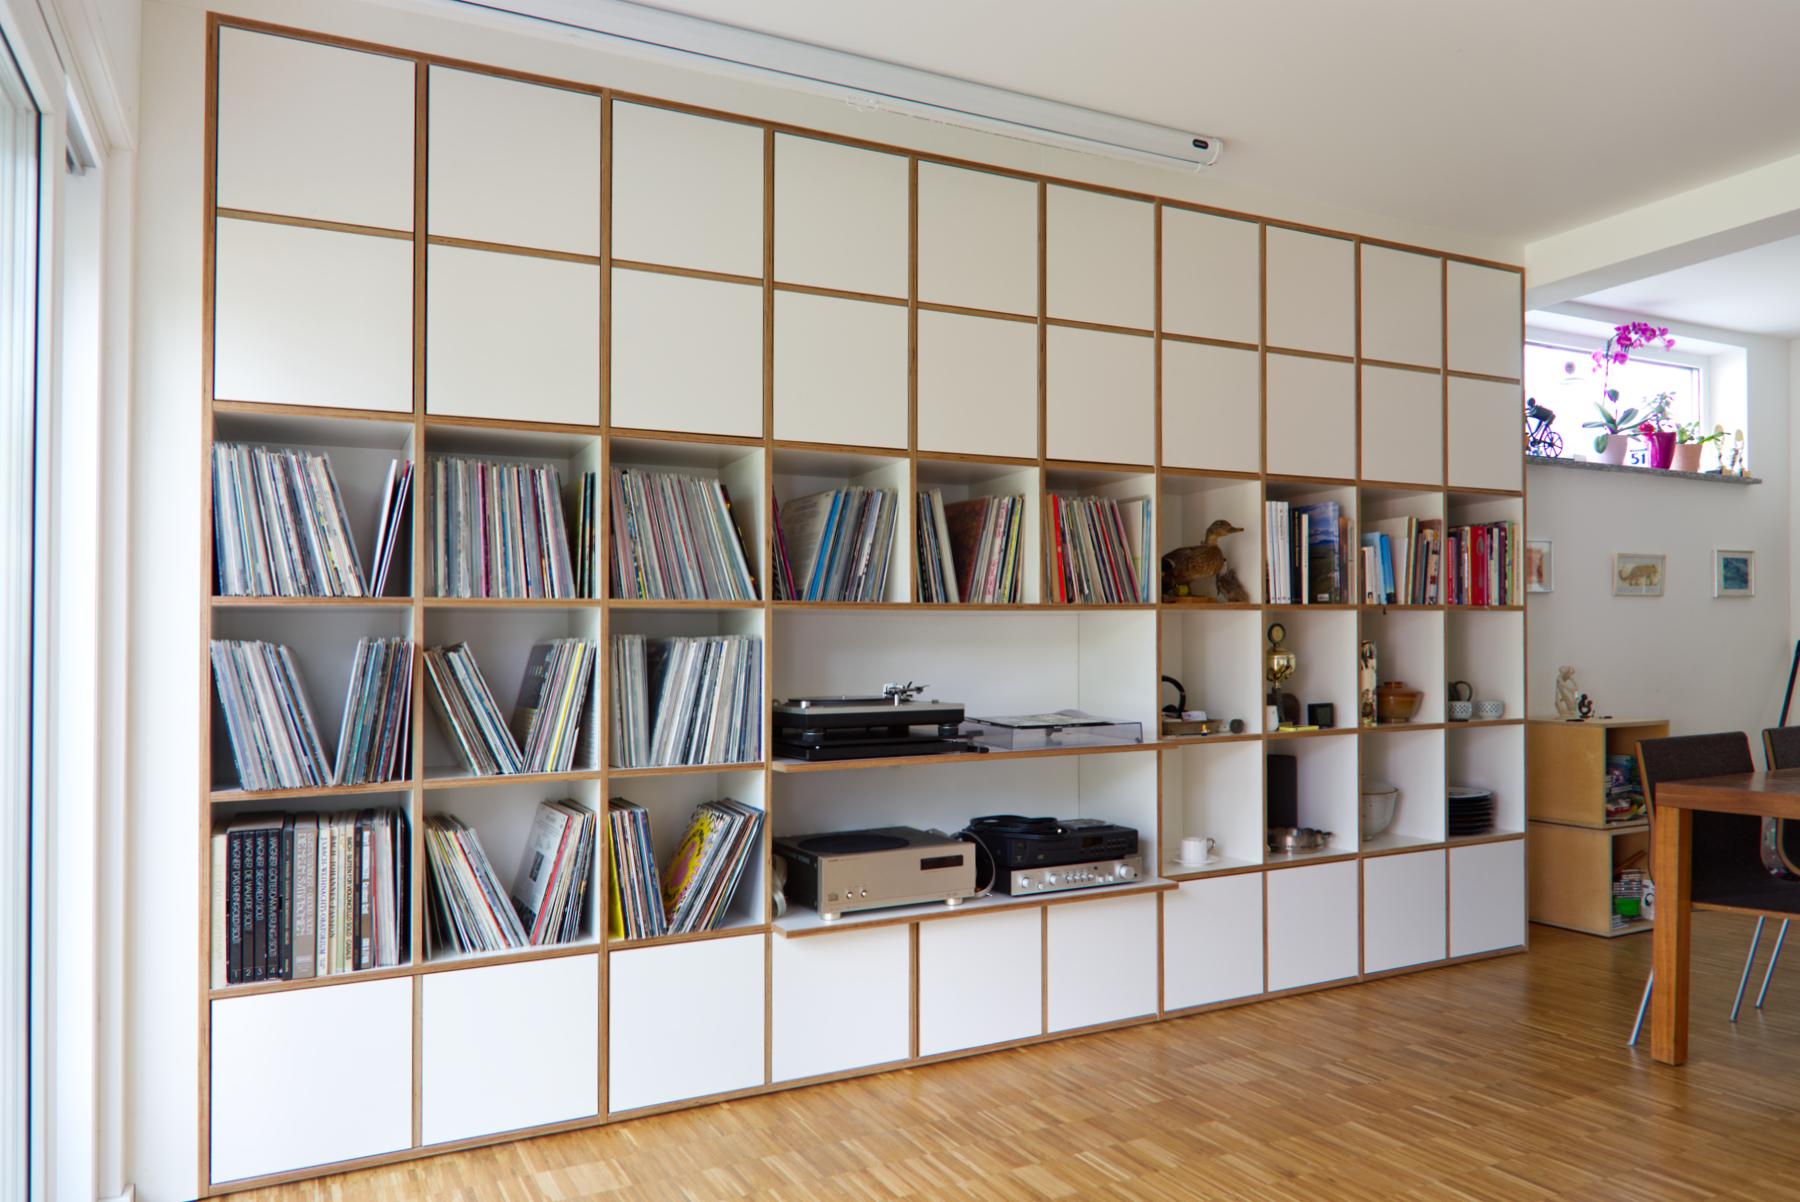 Möbeldesign, Innenausbau, Raumgestaltung